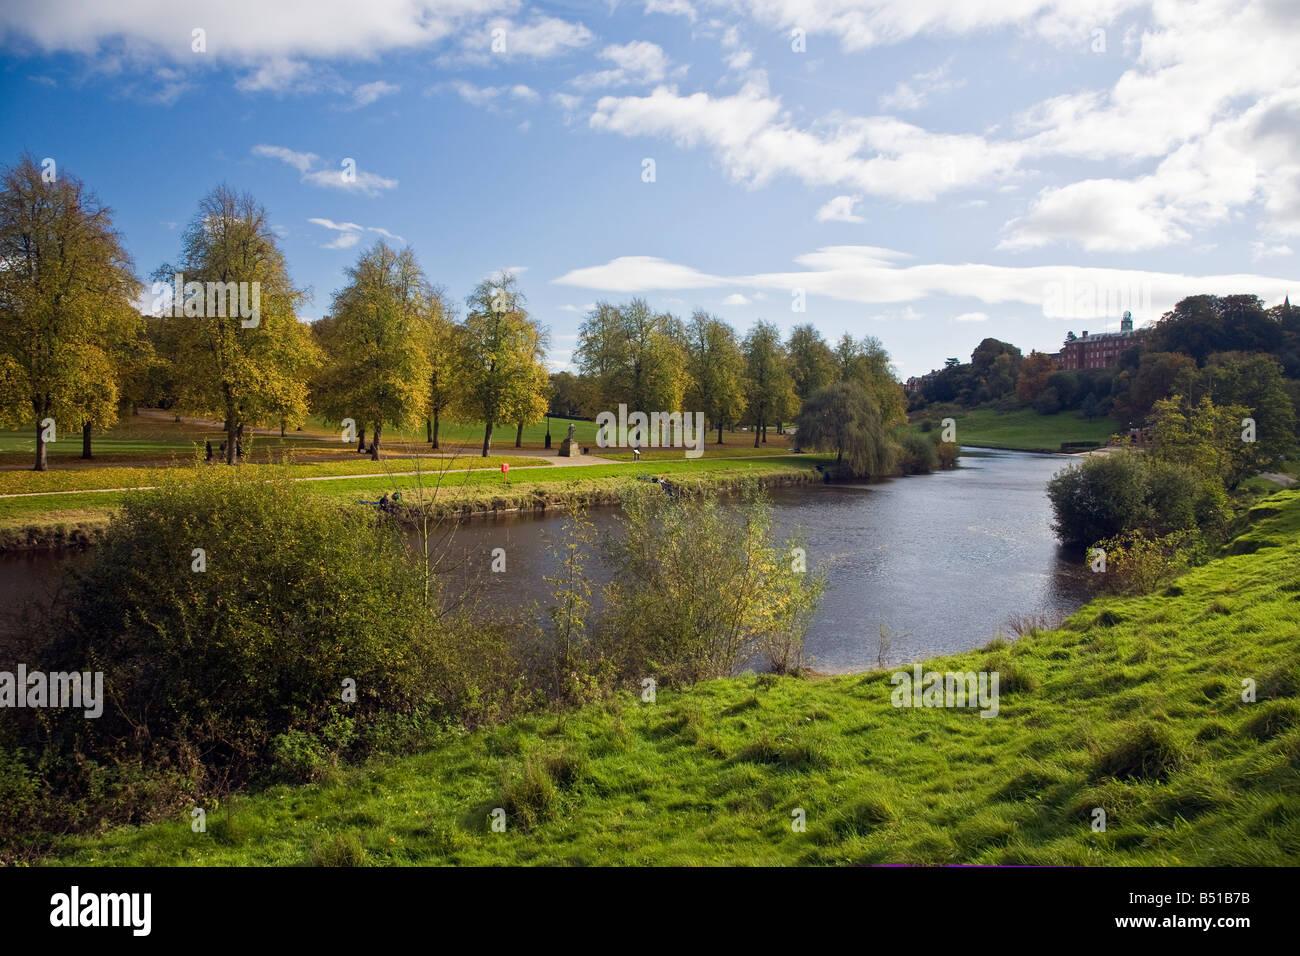 Shrewsbury School overlooking the River Severn and the Quarry Park in Shrewsbury Shropshire England UK United Kingdom - Stock Image